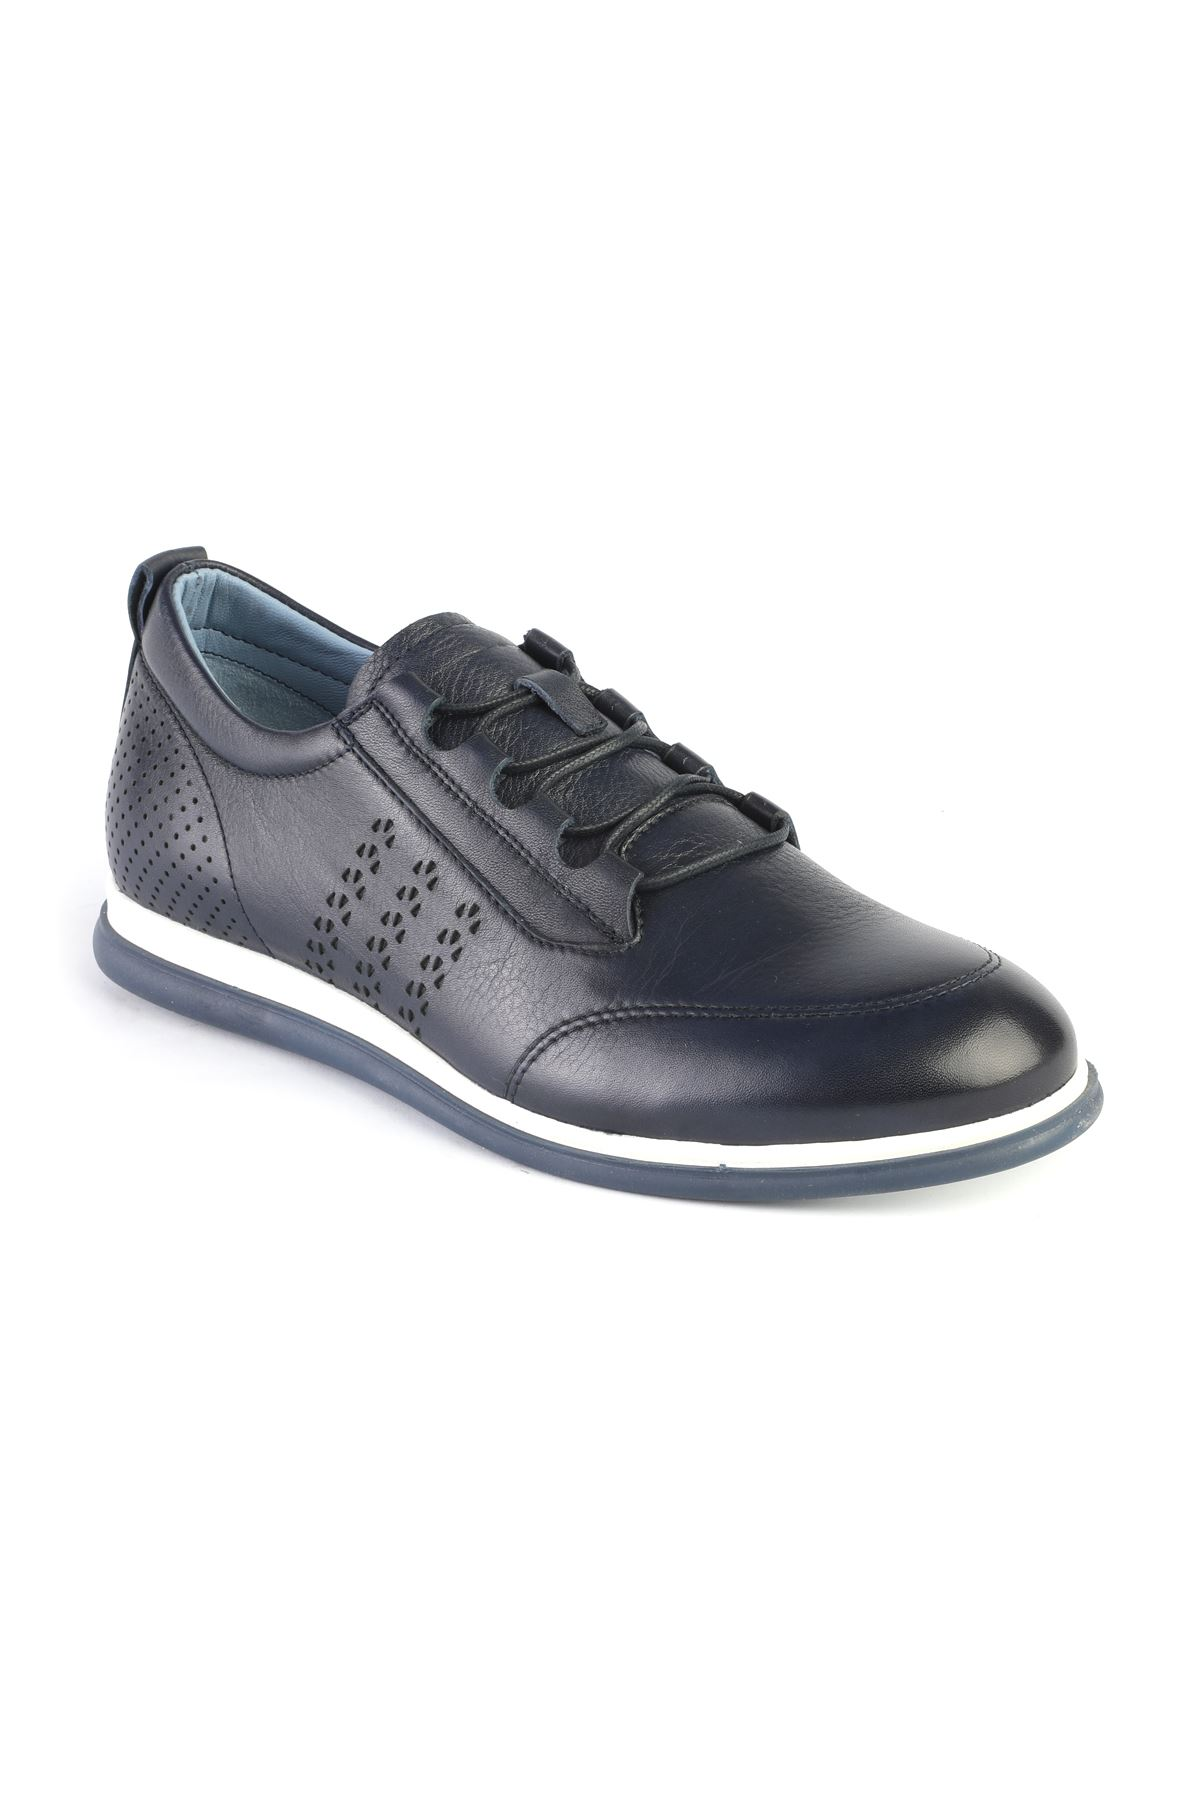 Libero 3274 Navy Blue Casual Shoes